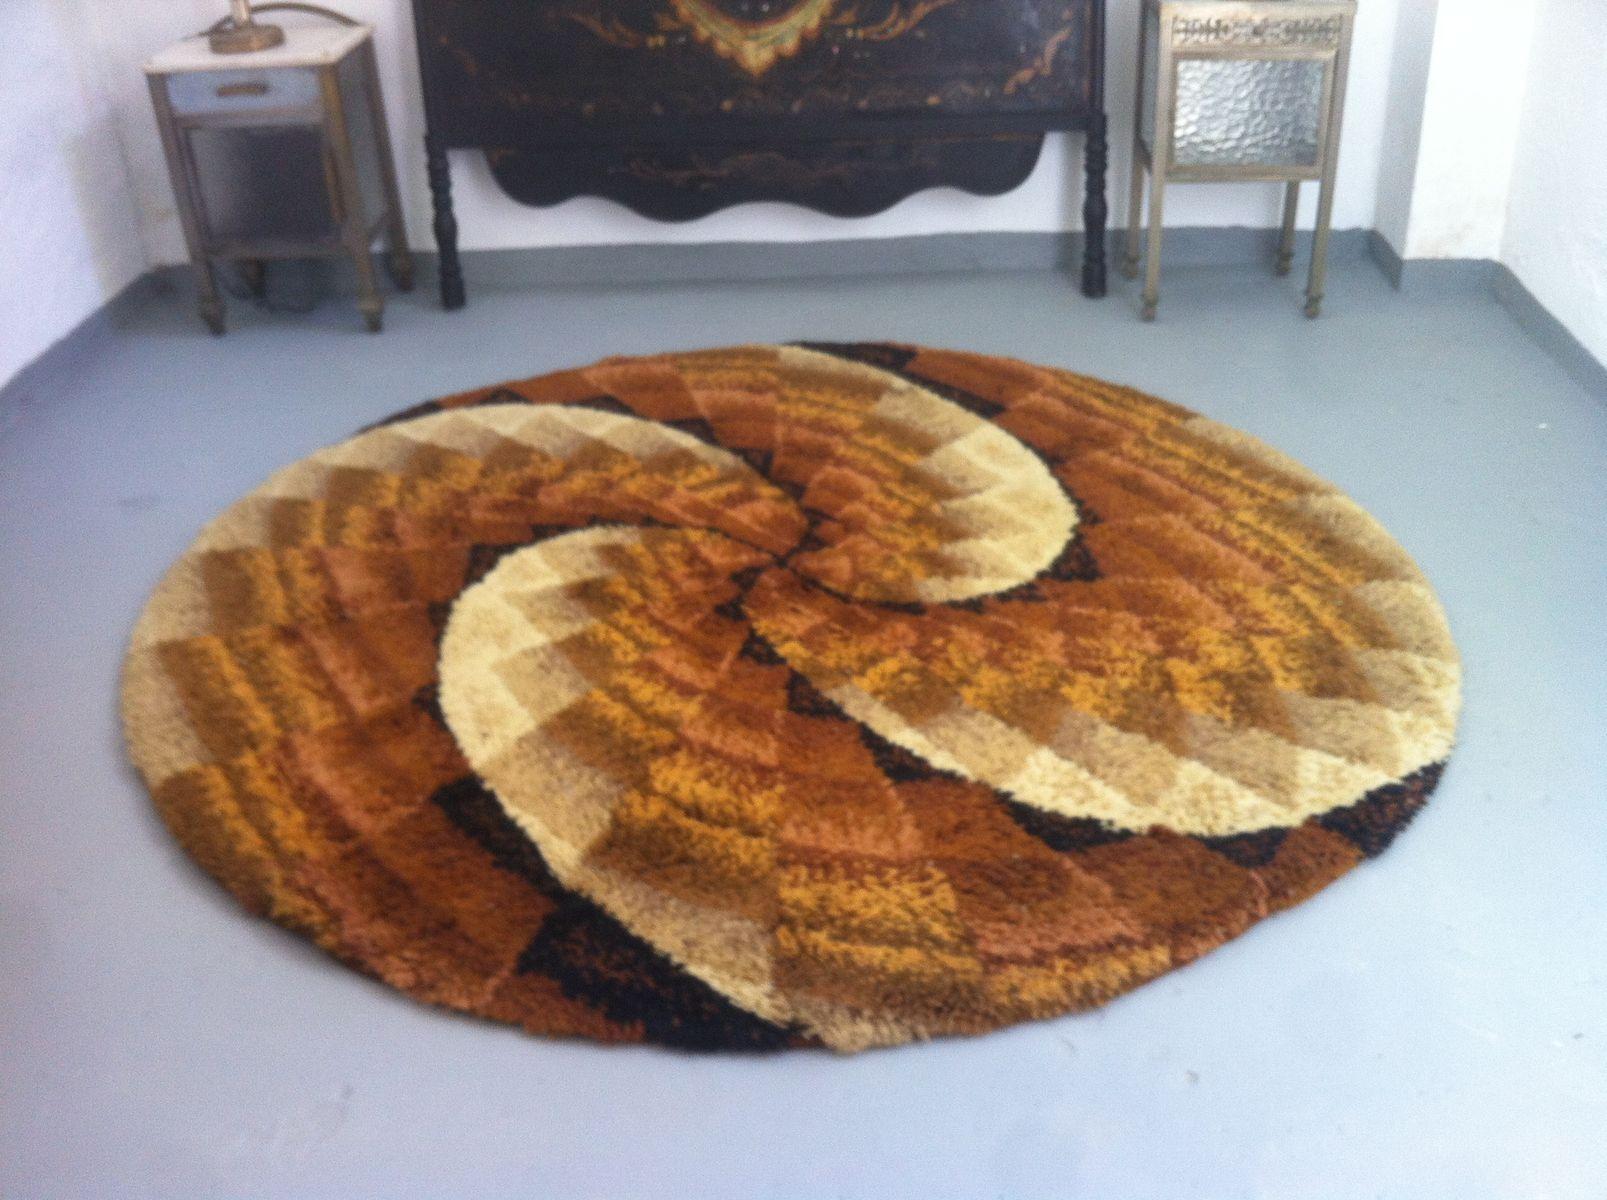 grand tapis mid century rond en laine scandinavie 1960s. Black Bedroom Furniture Sets. Home Design Ideas